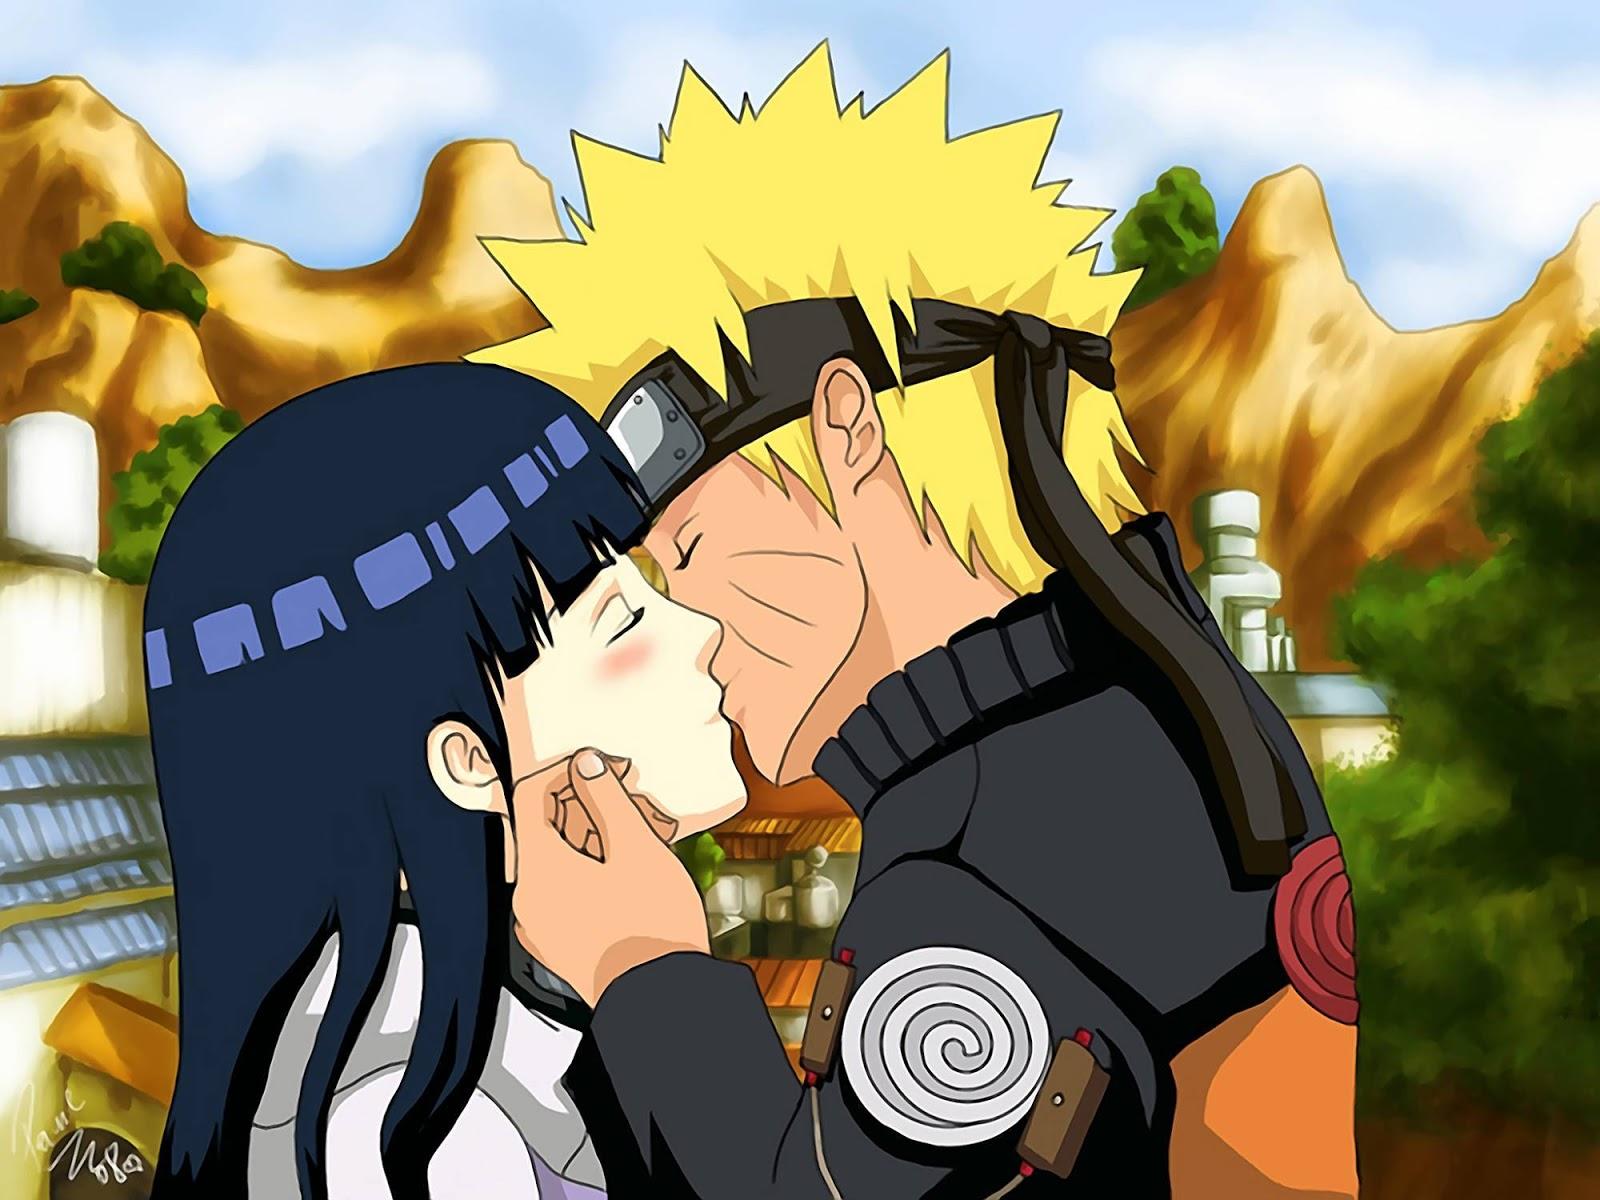 Wallpaper Naruto dan Hinata Romantis